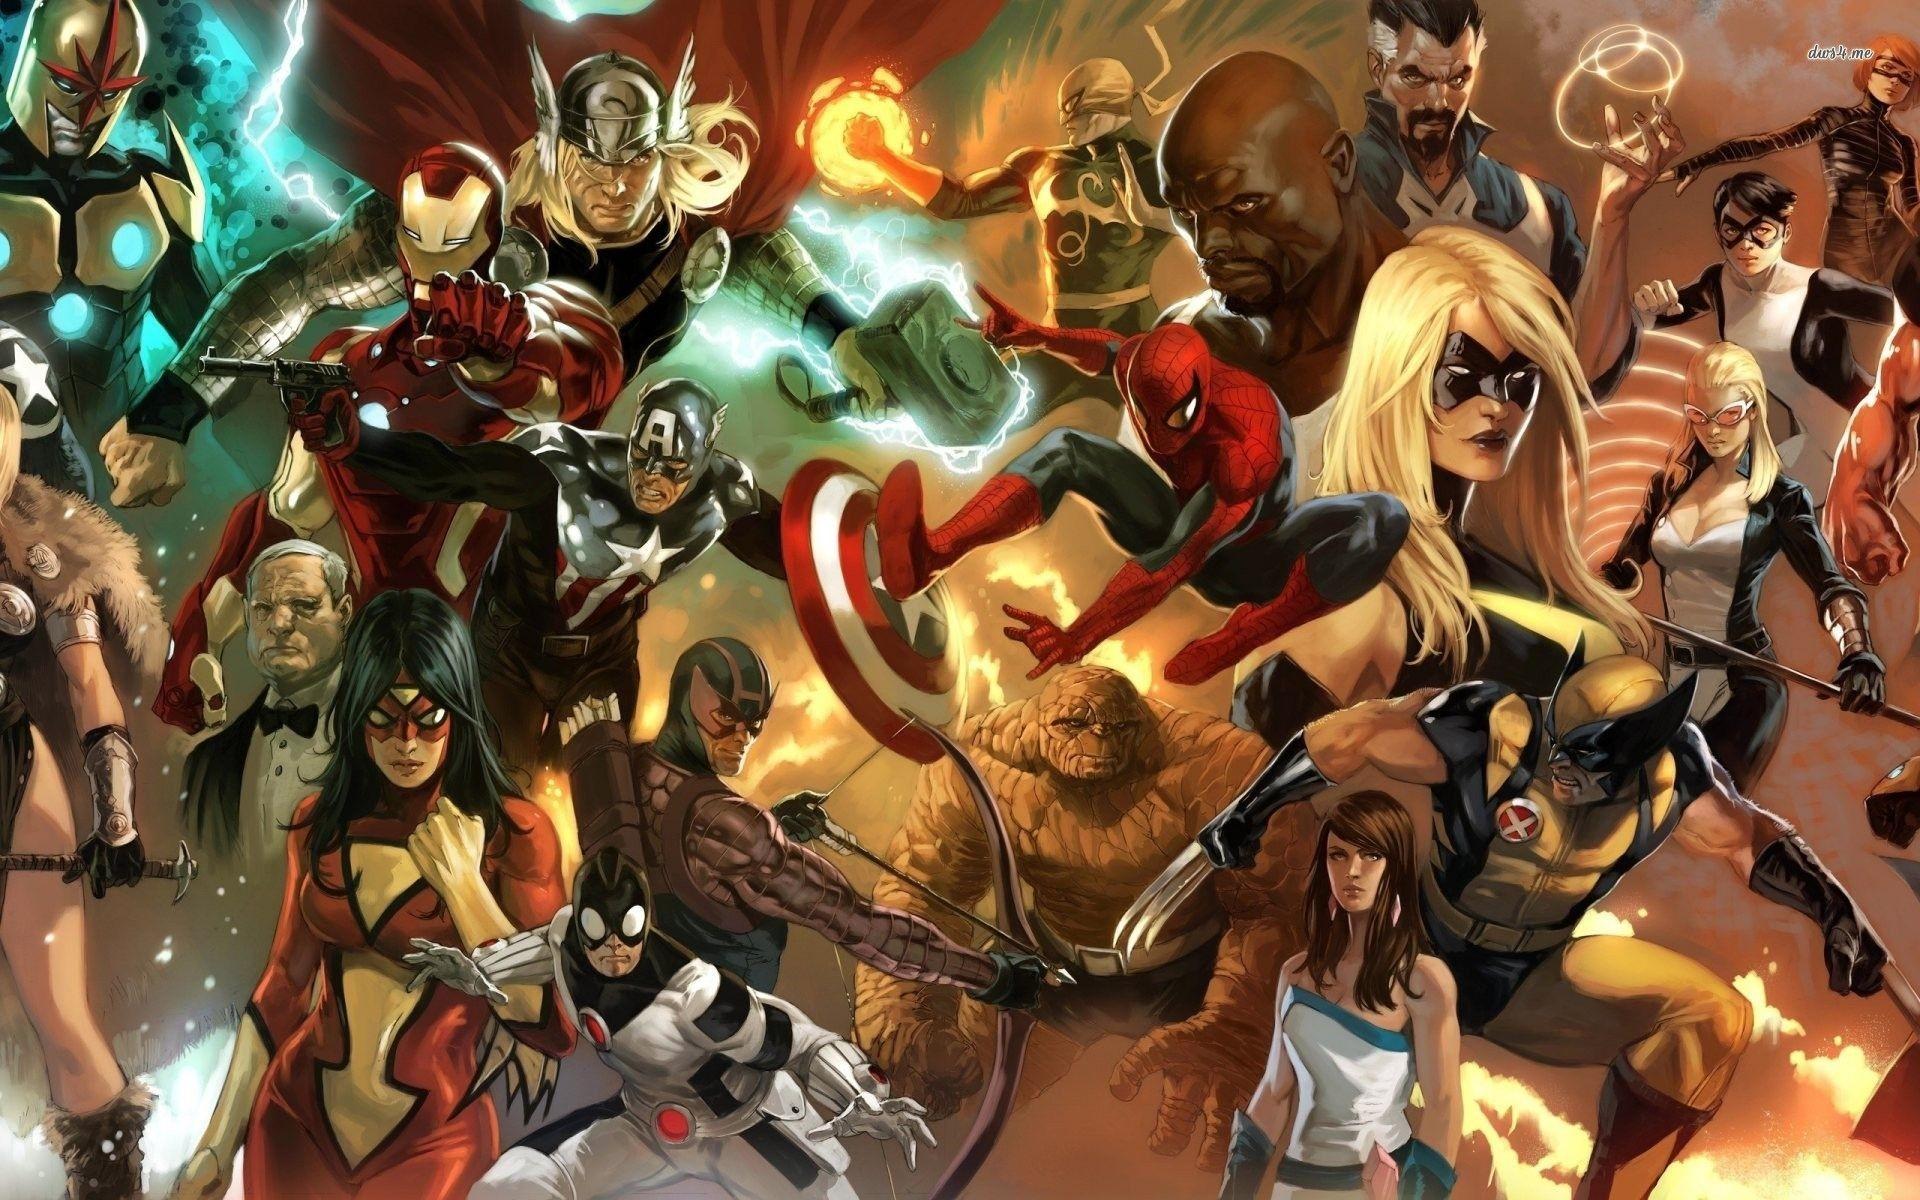 Super heroes wallpaper 64 images 2560x1600 iron man super hero superheroes marvel hd wallpaper high resolution amazing smart phone 25601600 wallpaper hd voltagebd Gallery